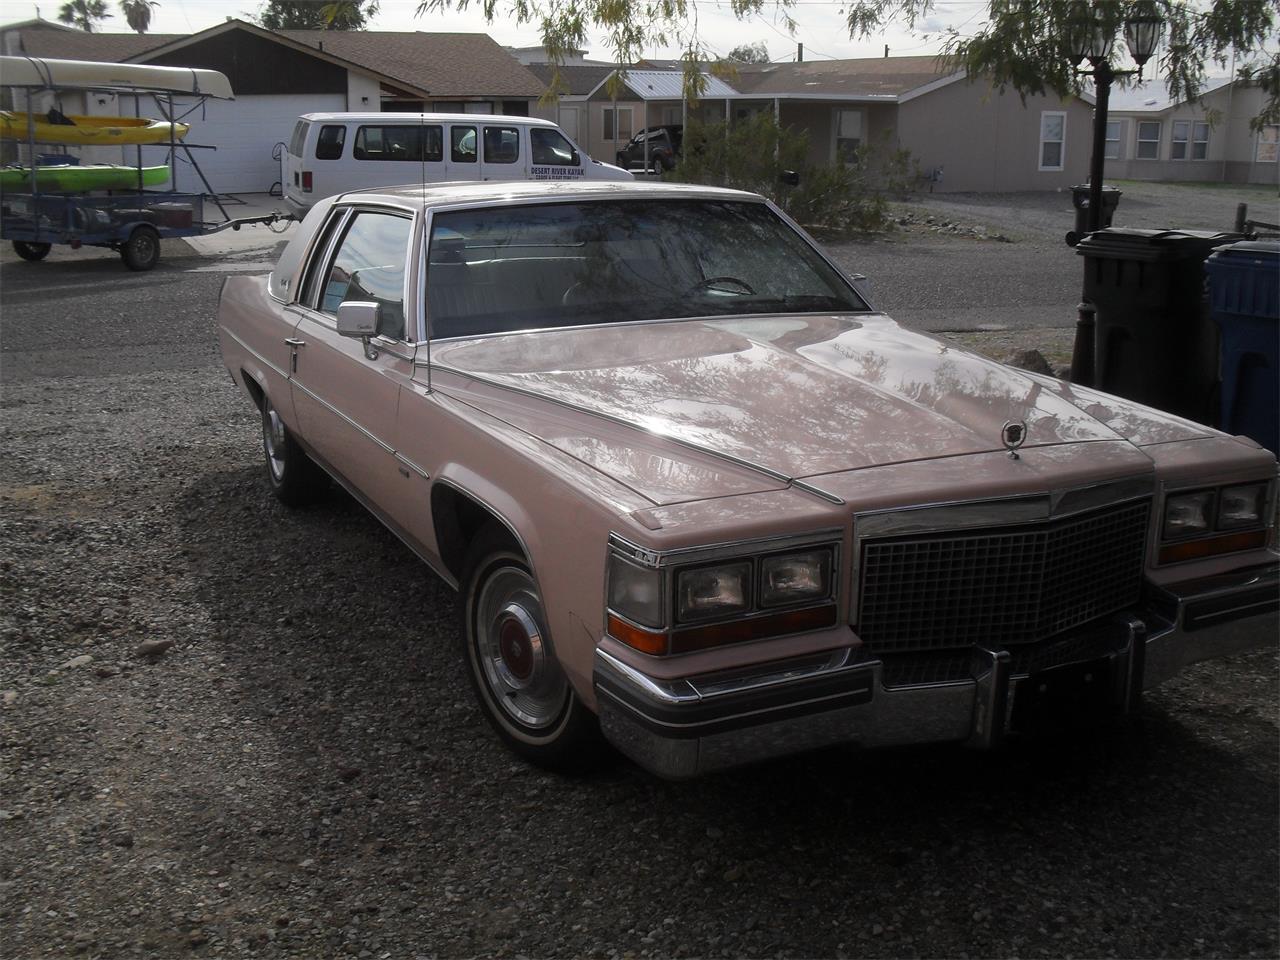 1981 Cadillac Coupe DeVille (CC-1318628) for sale in Bullhead City, Arizona